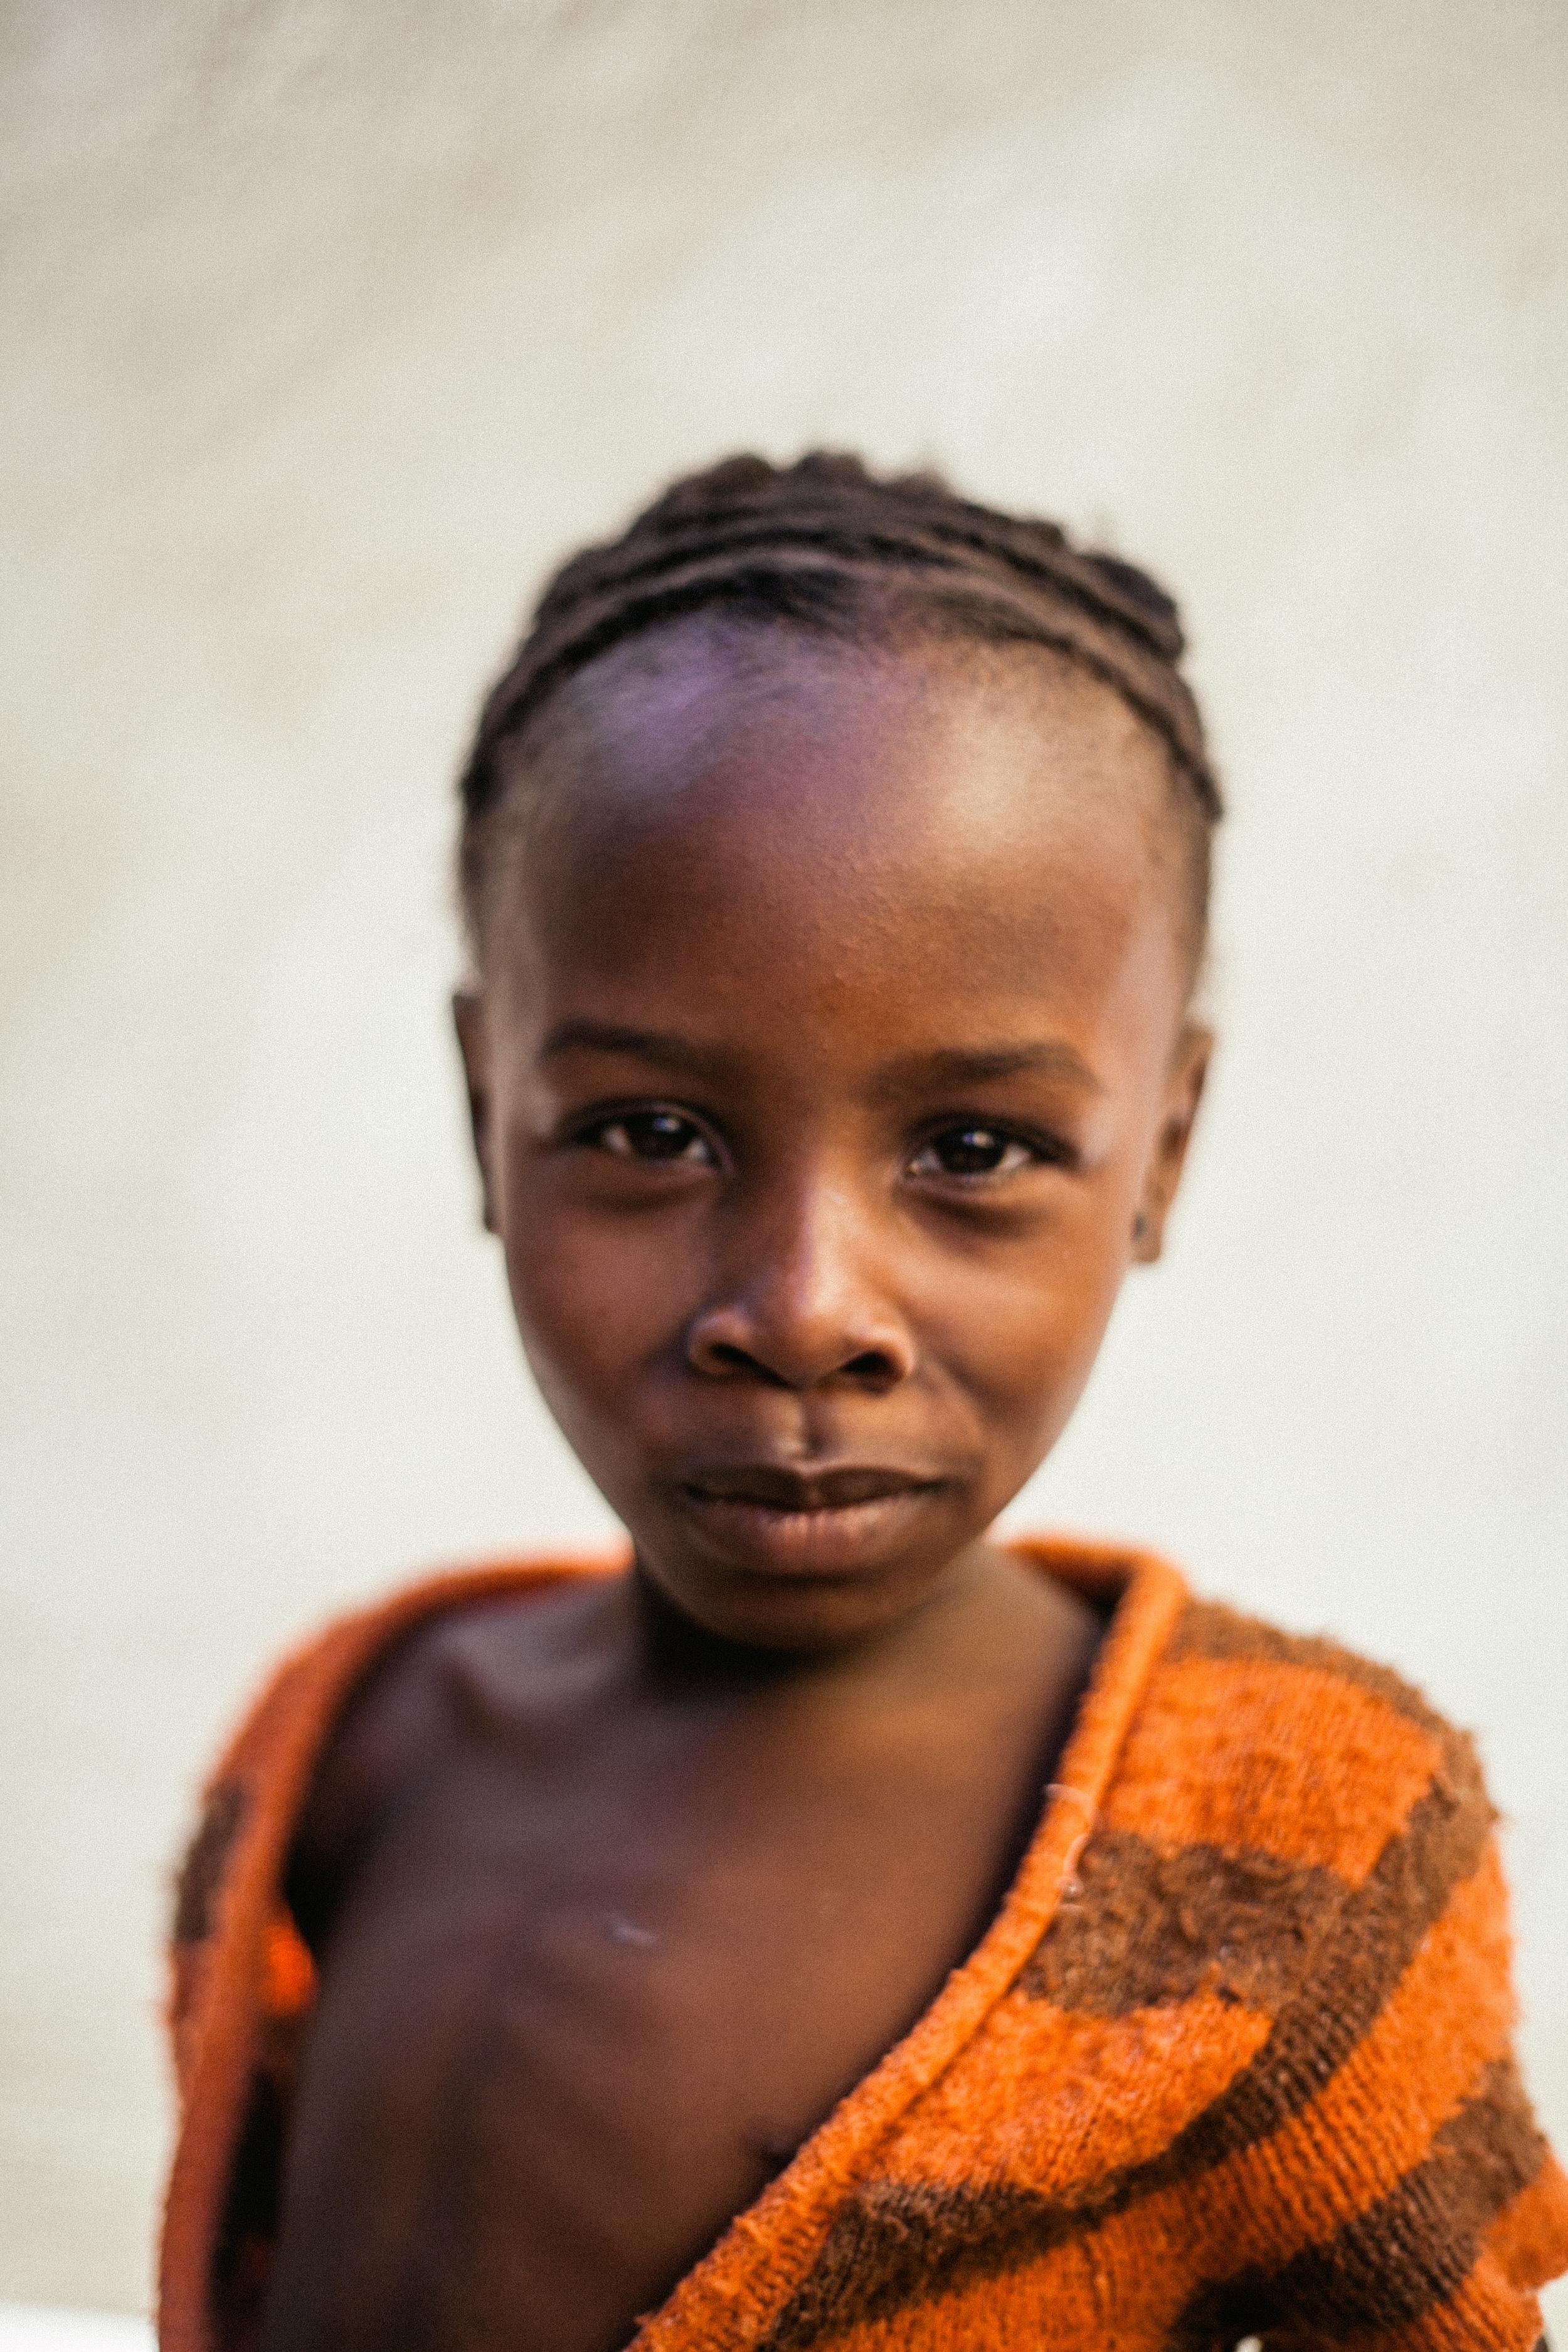 Haiti5starslores168.jpg